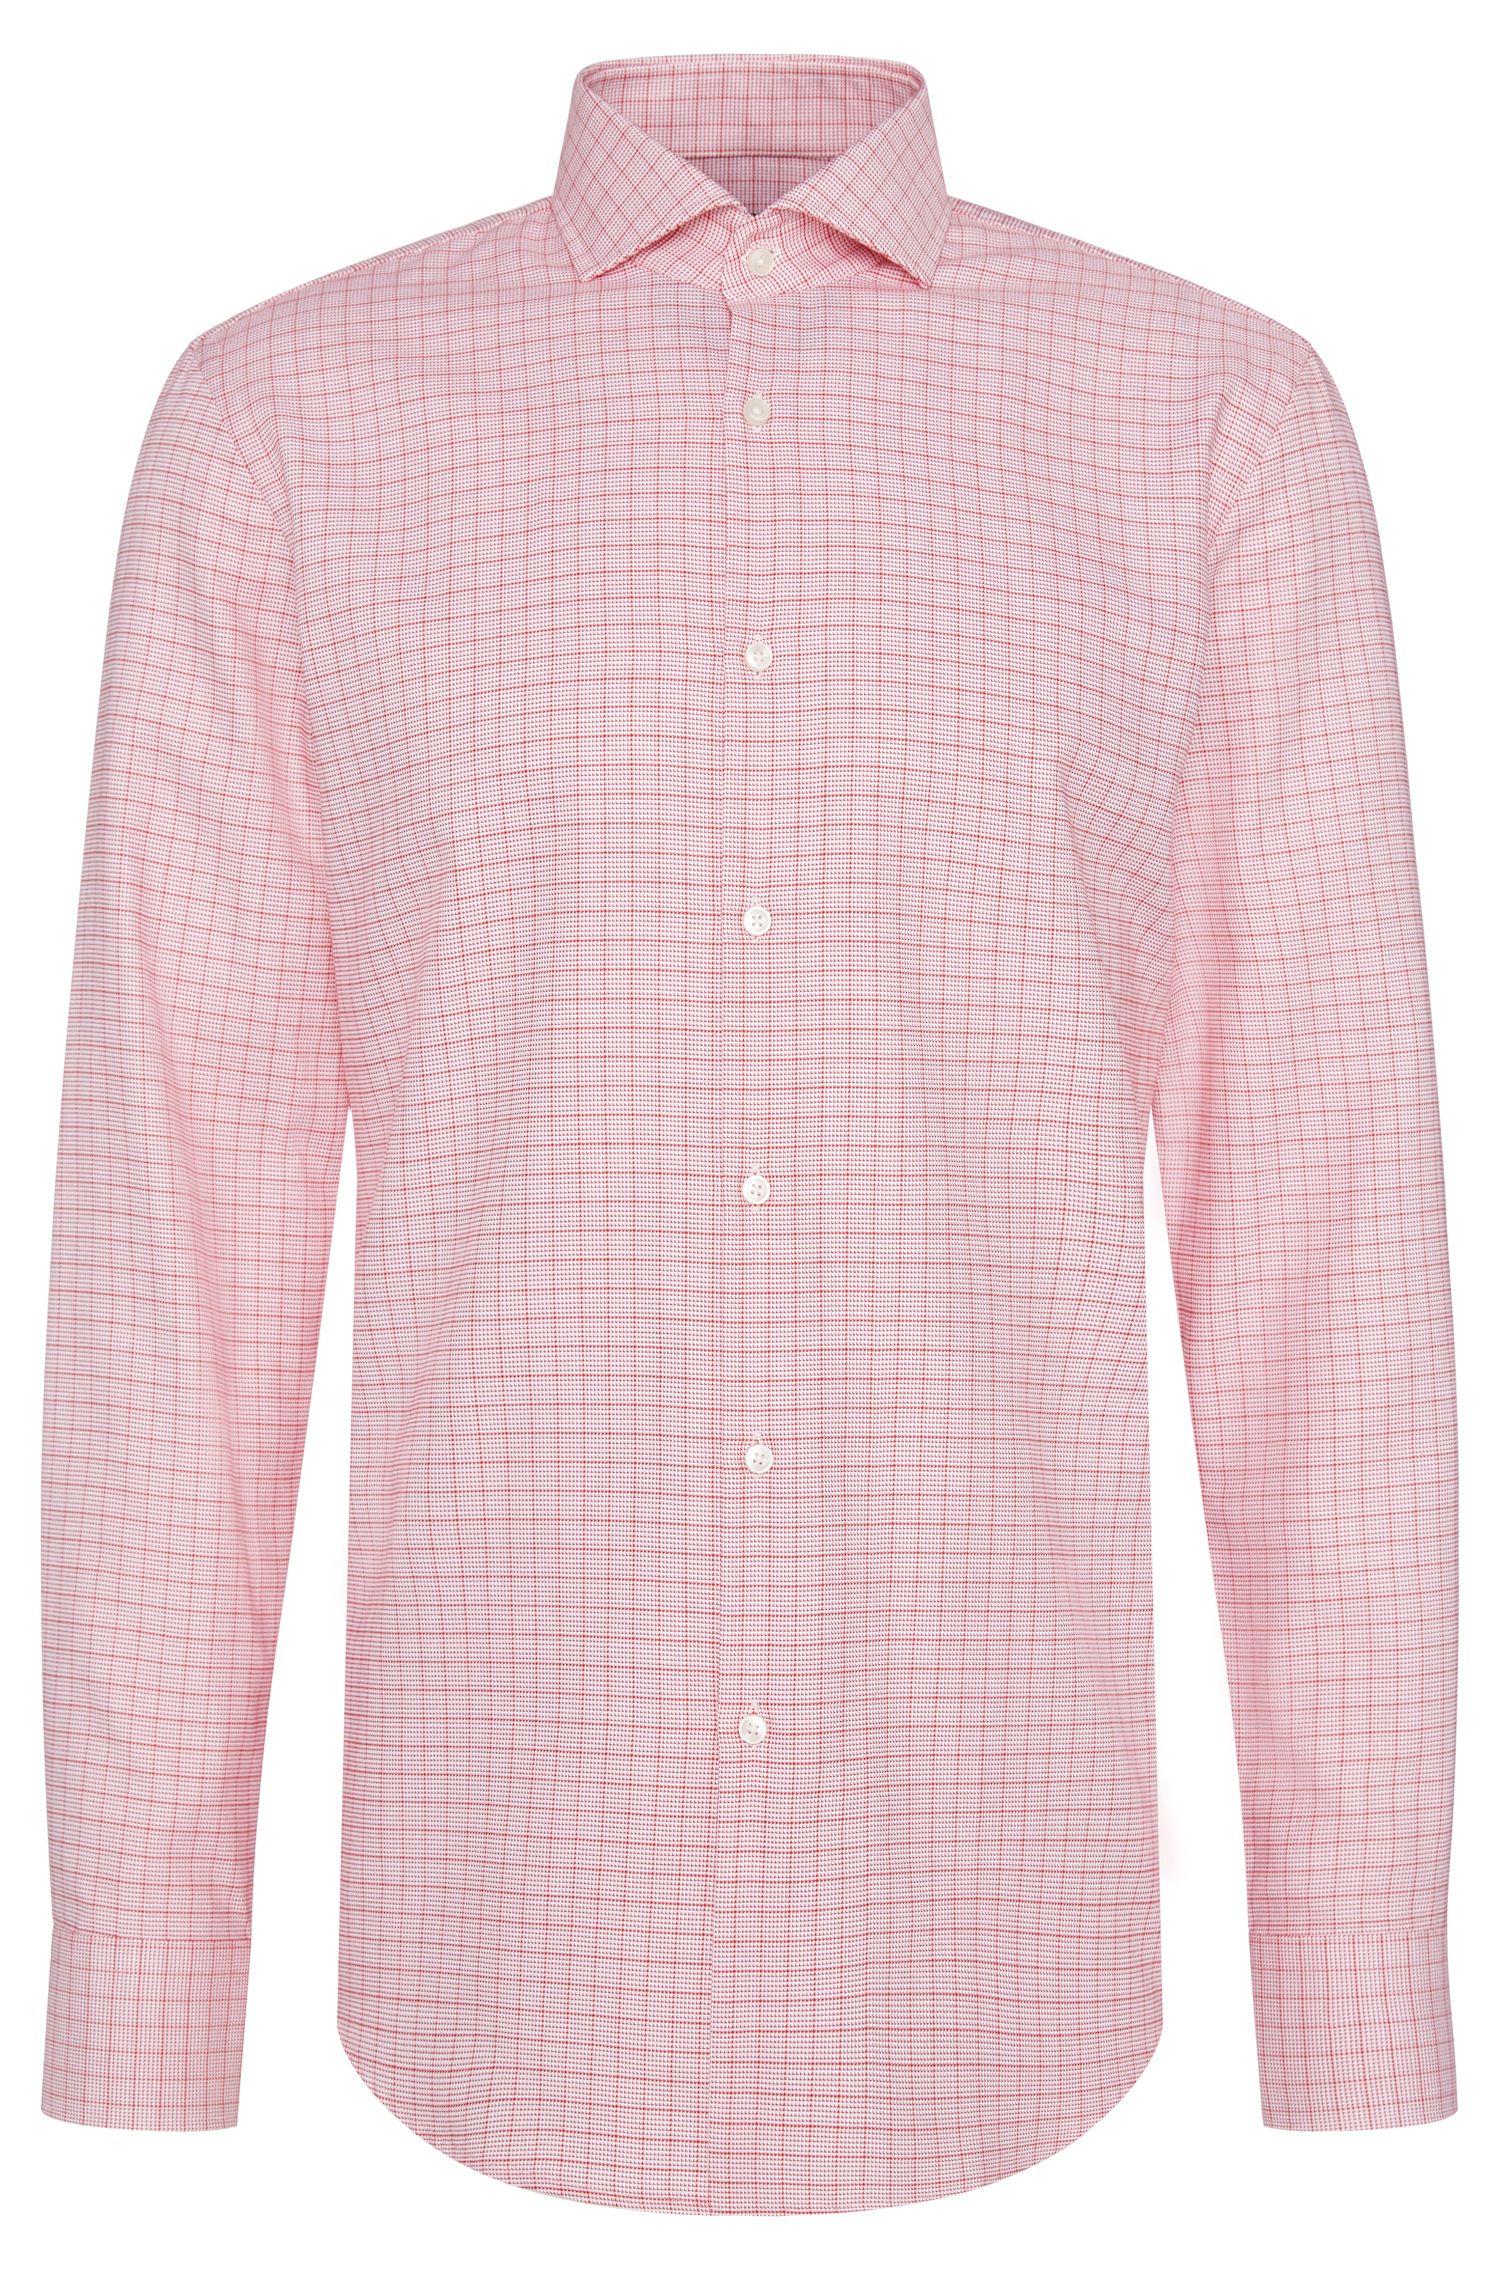 Checked Cotton Dress Shirt, Slim Fit   Jason